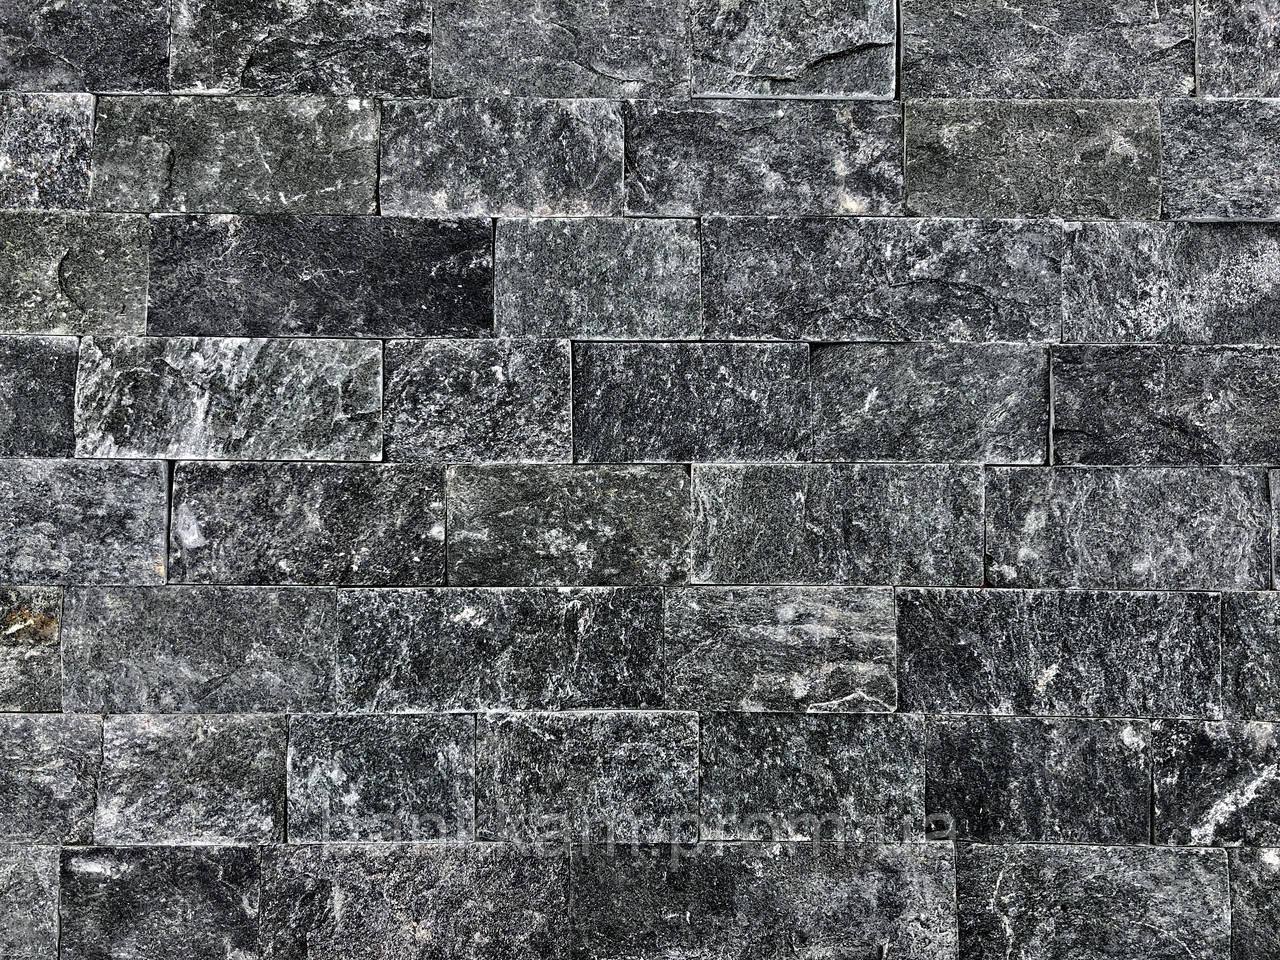 Плитка Смарагдова Болгарія 6 см. (уп. 0,5 м2)